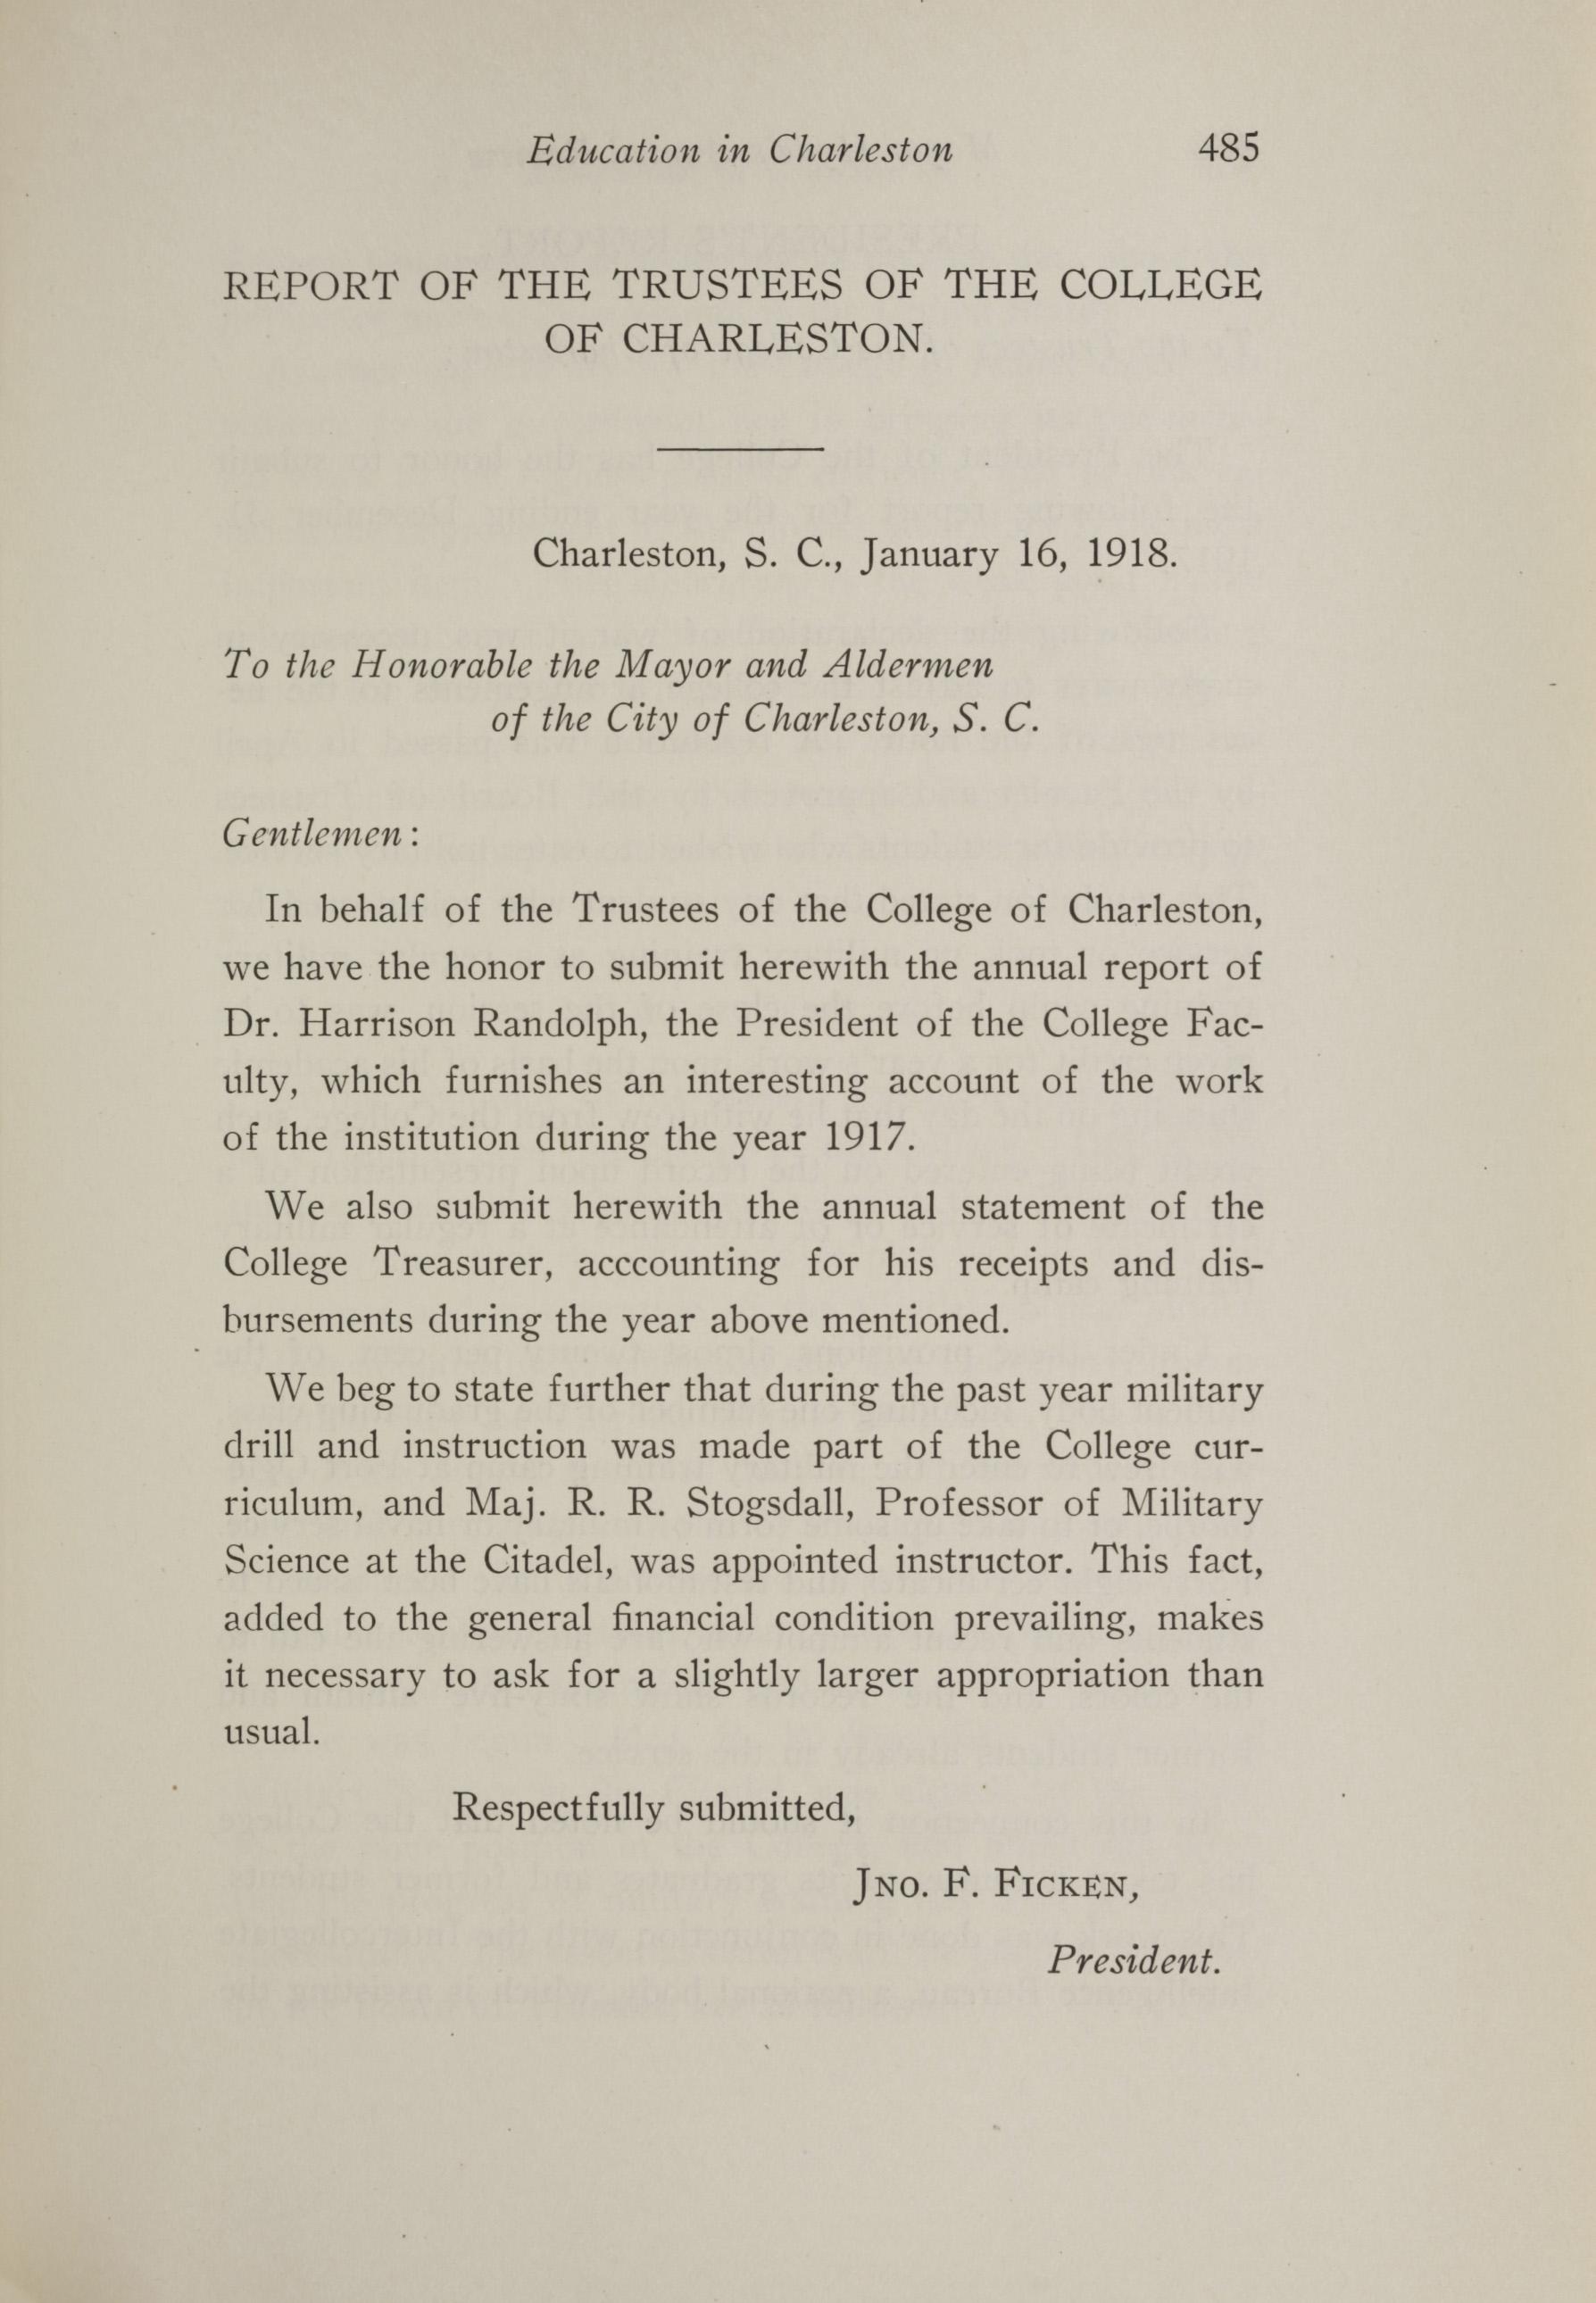 Charleston Yearbook, 1917, page 485